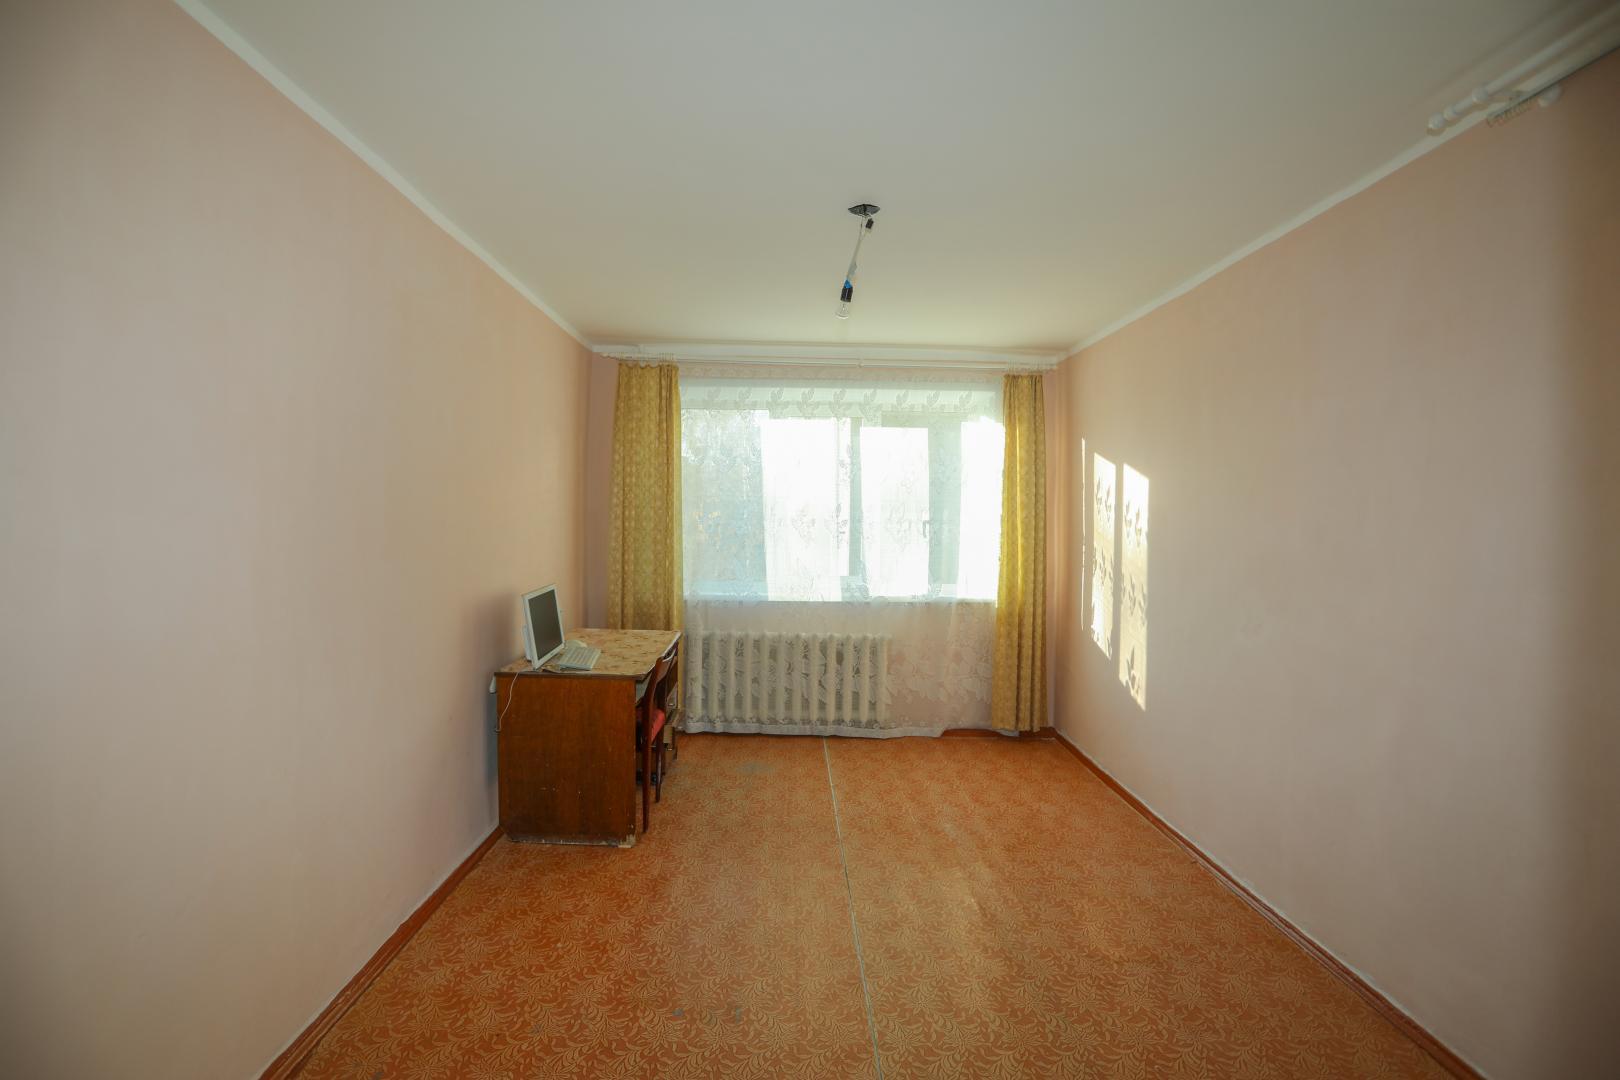 Продам Квартиру в Иркутске